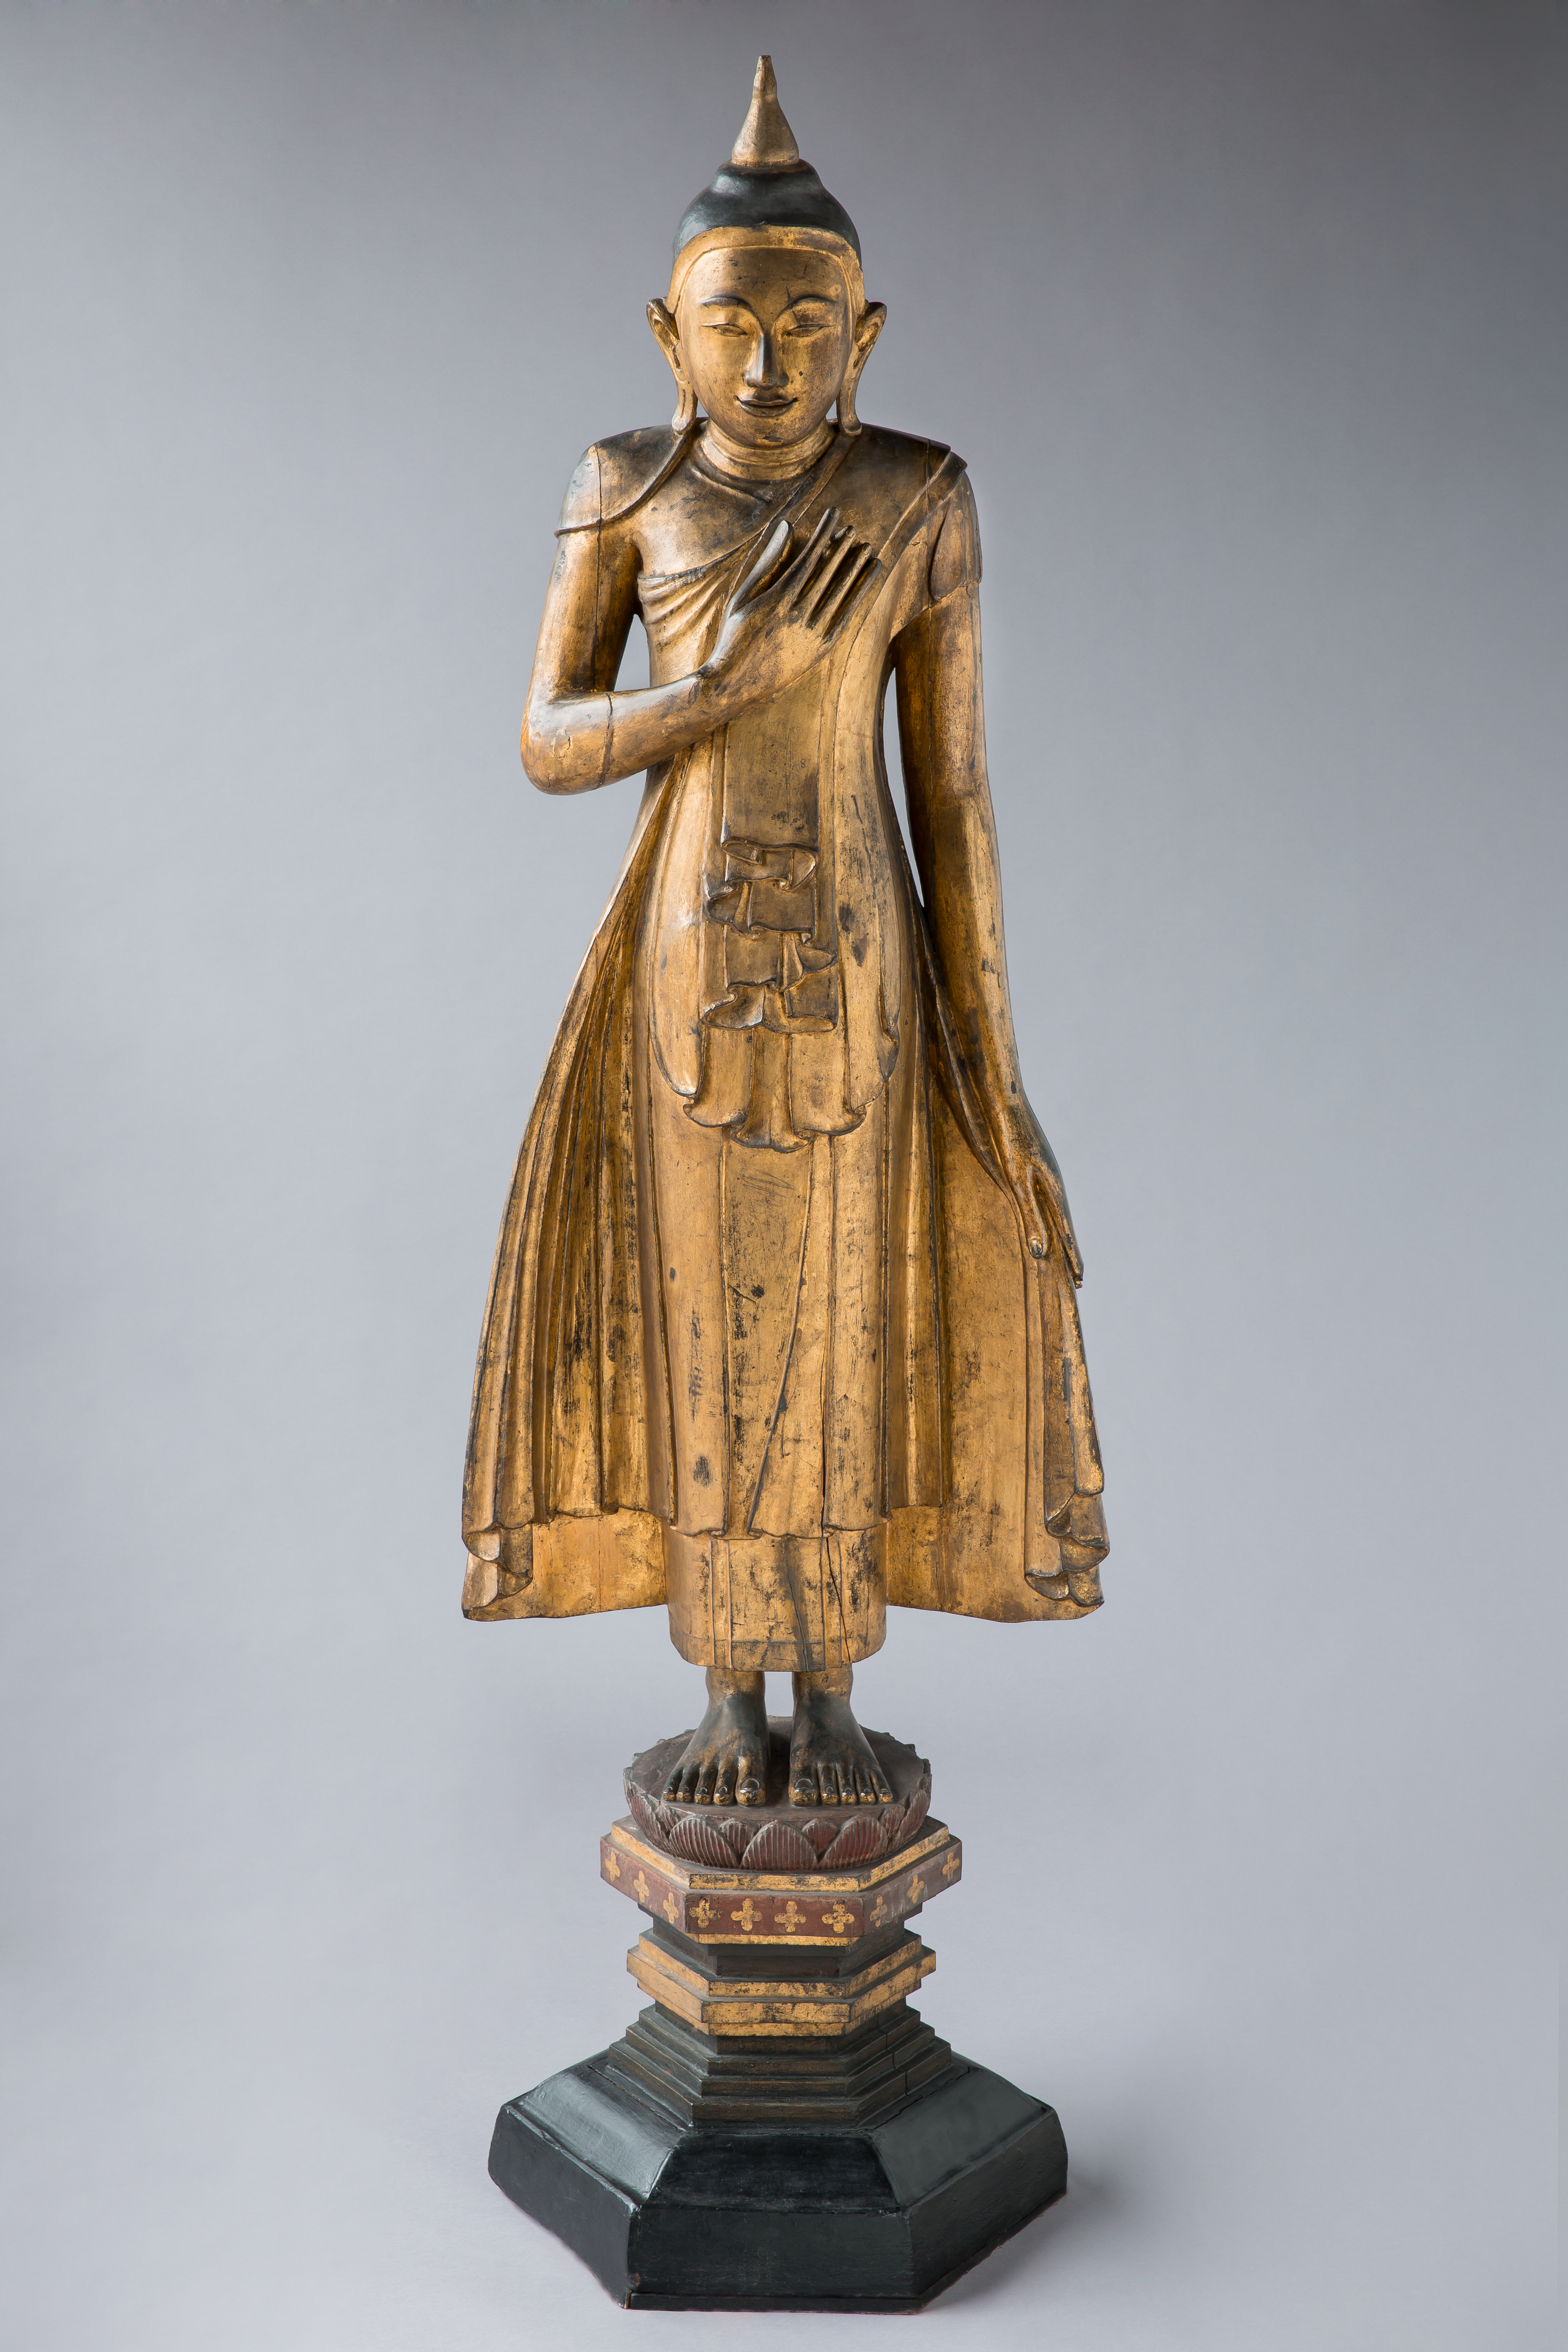 Figur, gold, lakiert zeigt Buddha Siddharta Gautama